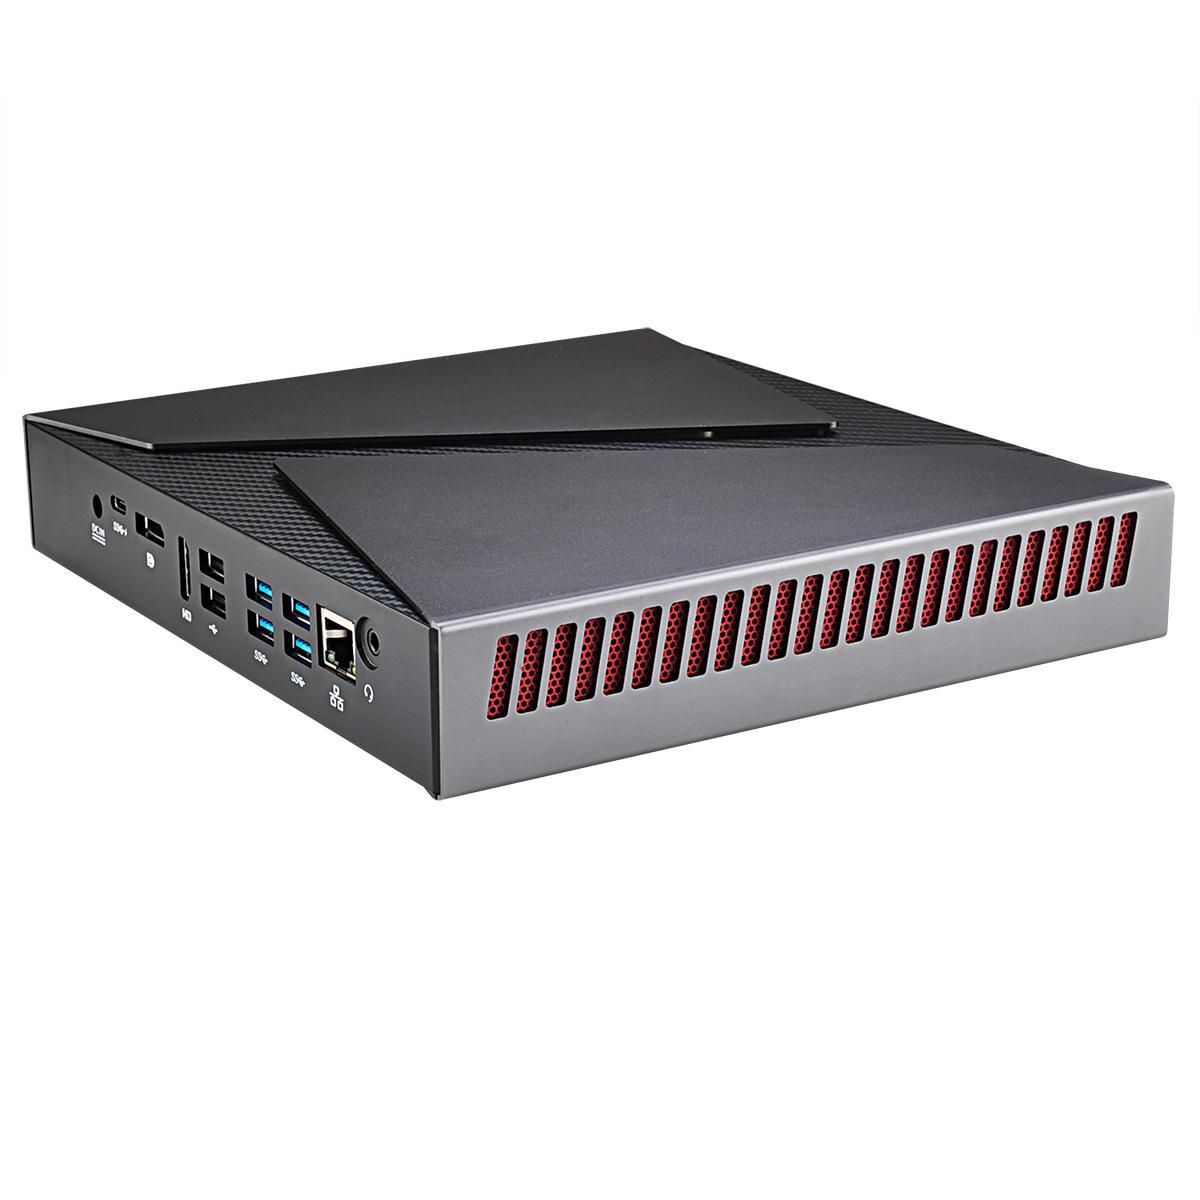 [Précommande] Mini PC Nvisen GX01 - Intel Core I5-9300H, 8Go de RAm, SSD 256 Go